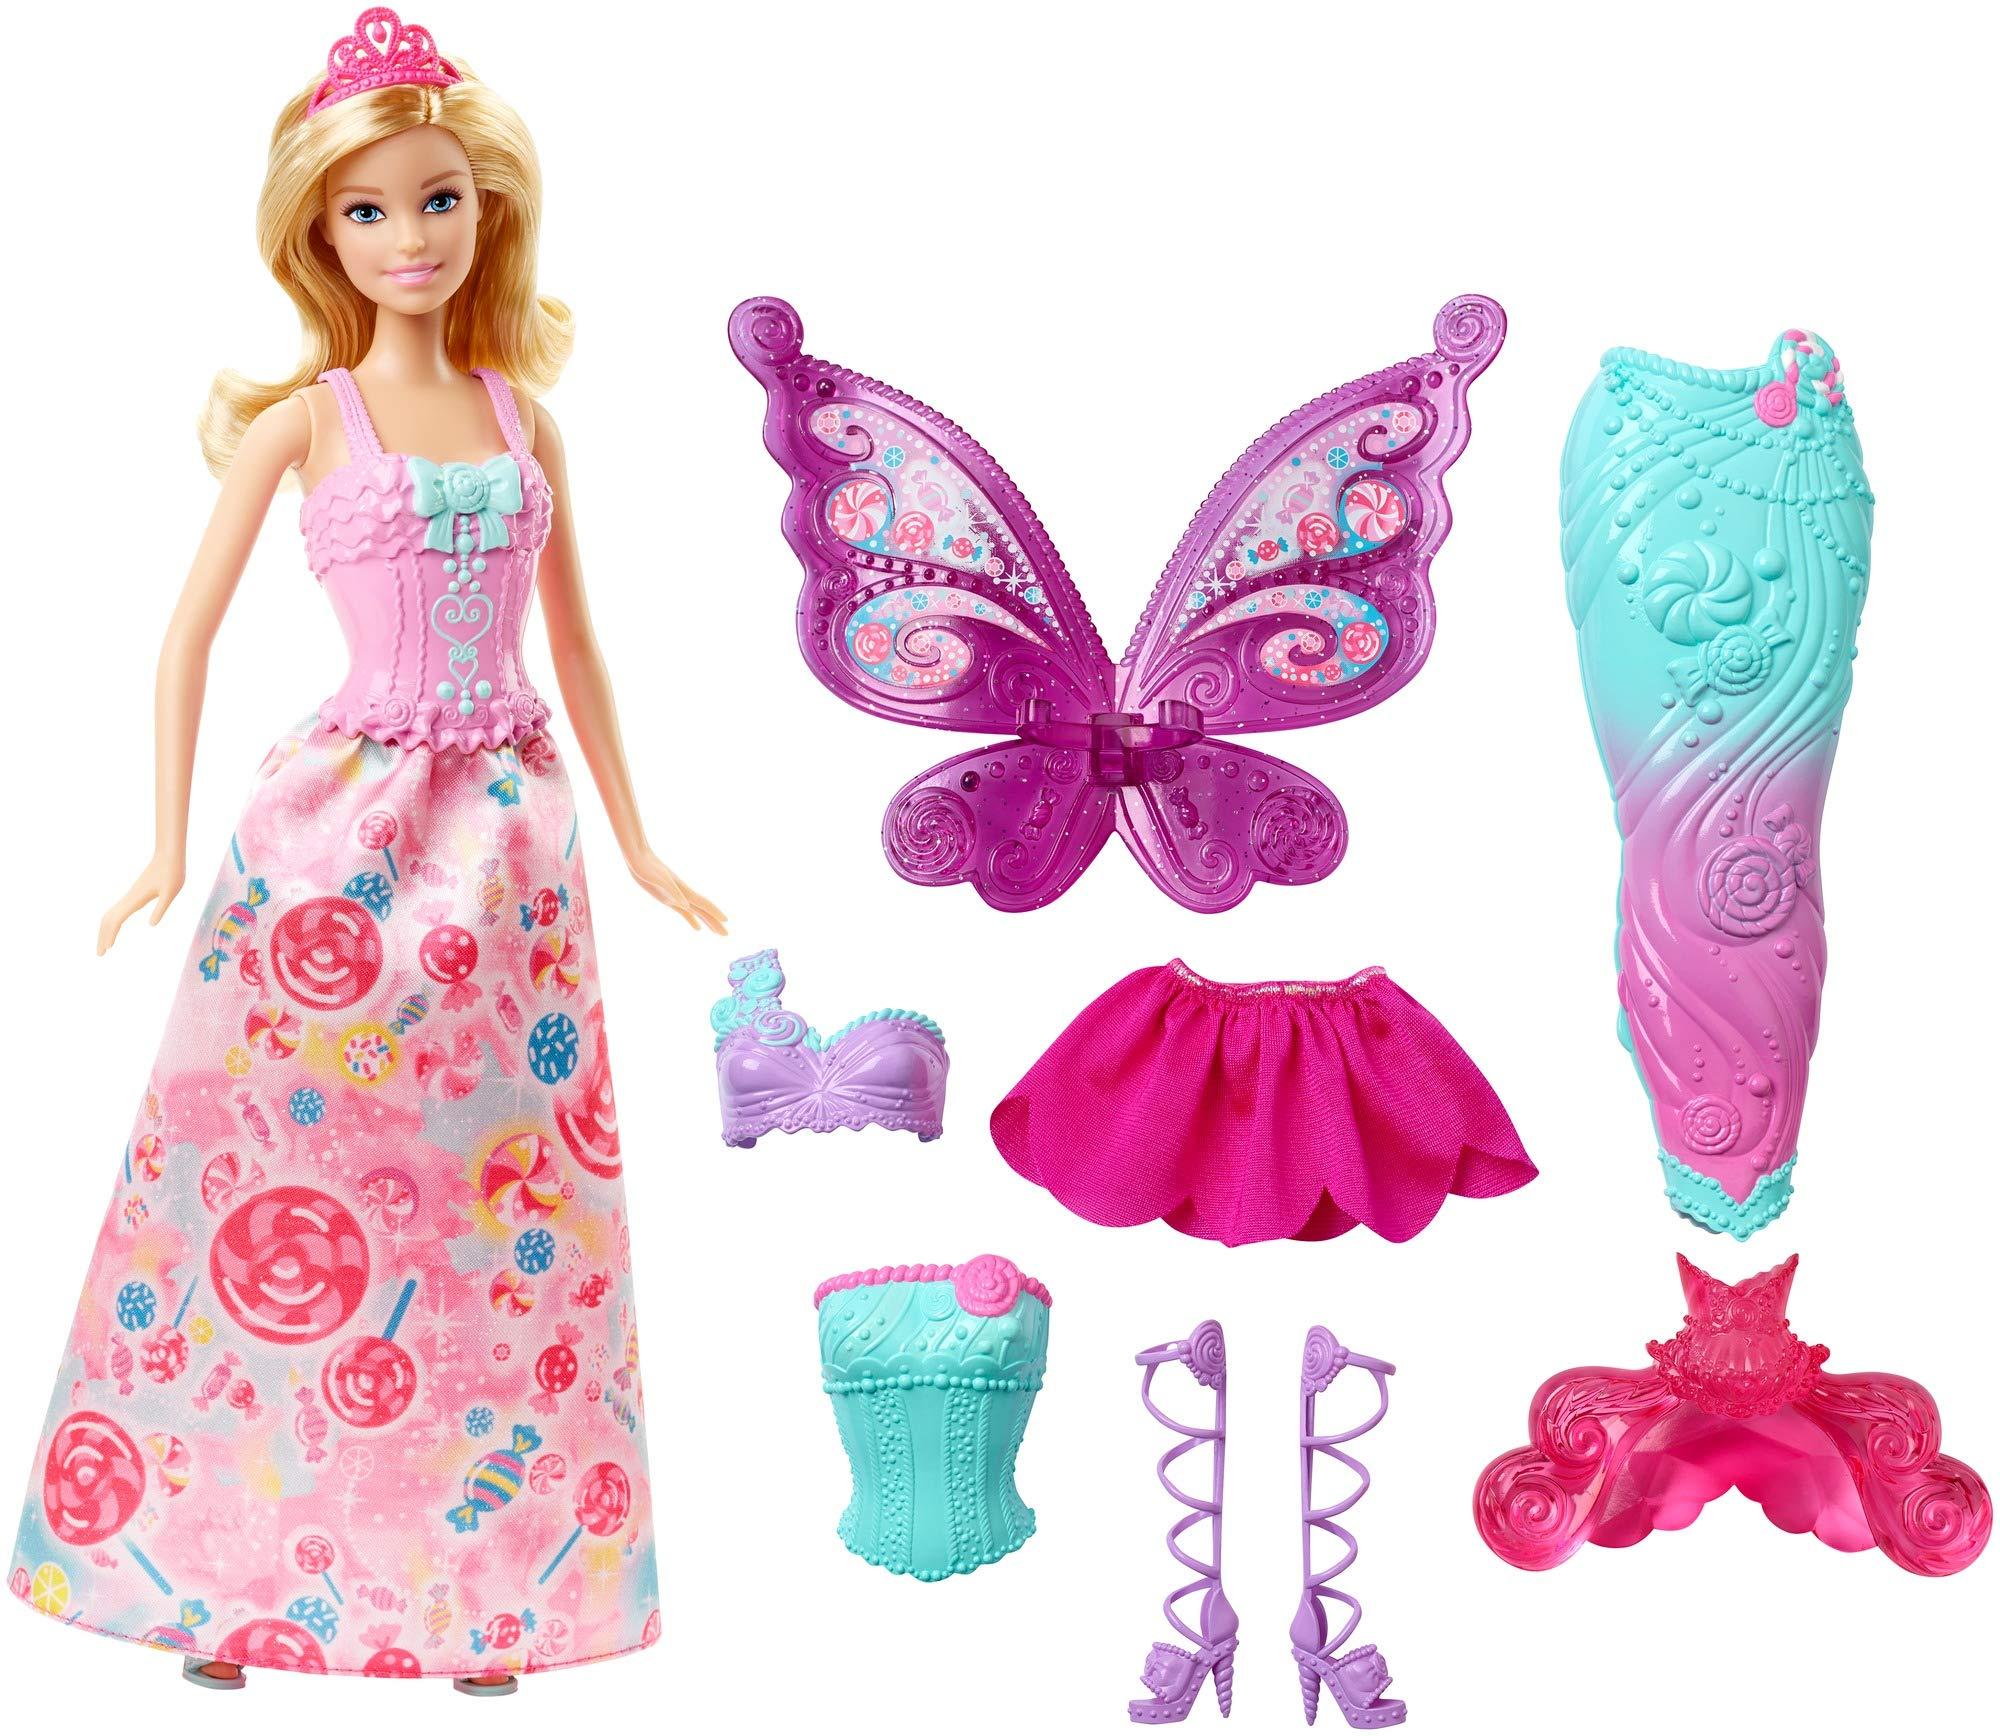 Barbie Dreamtopia Fairytale Dress Doll